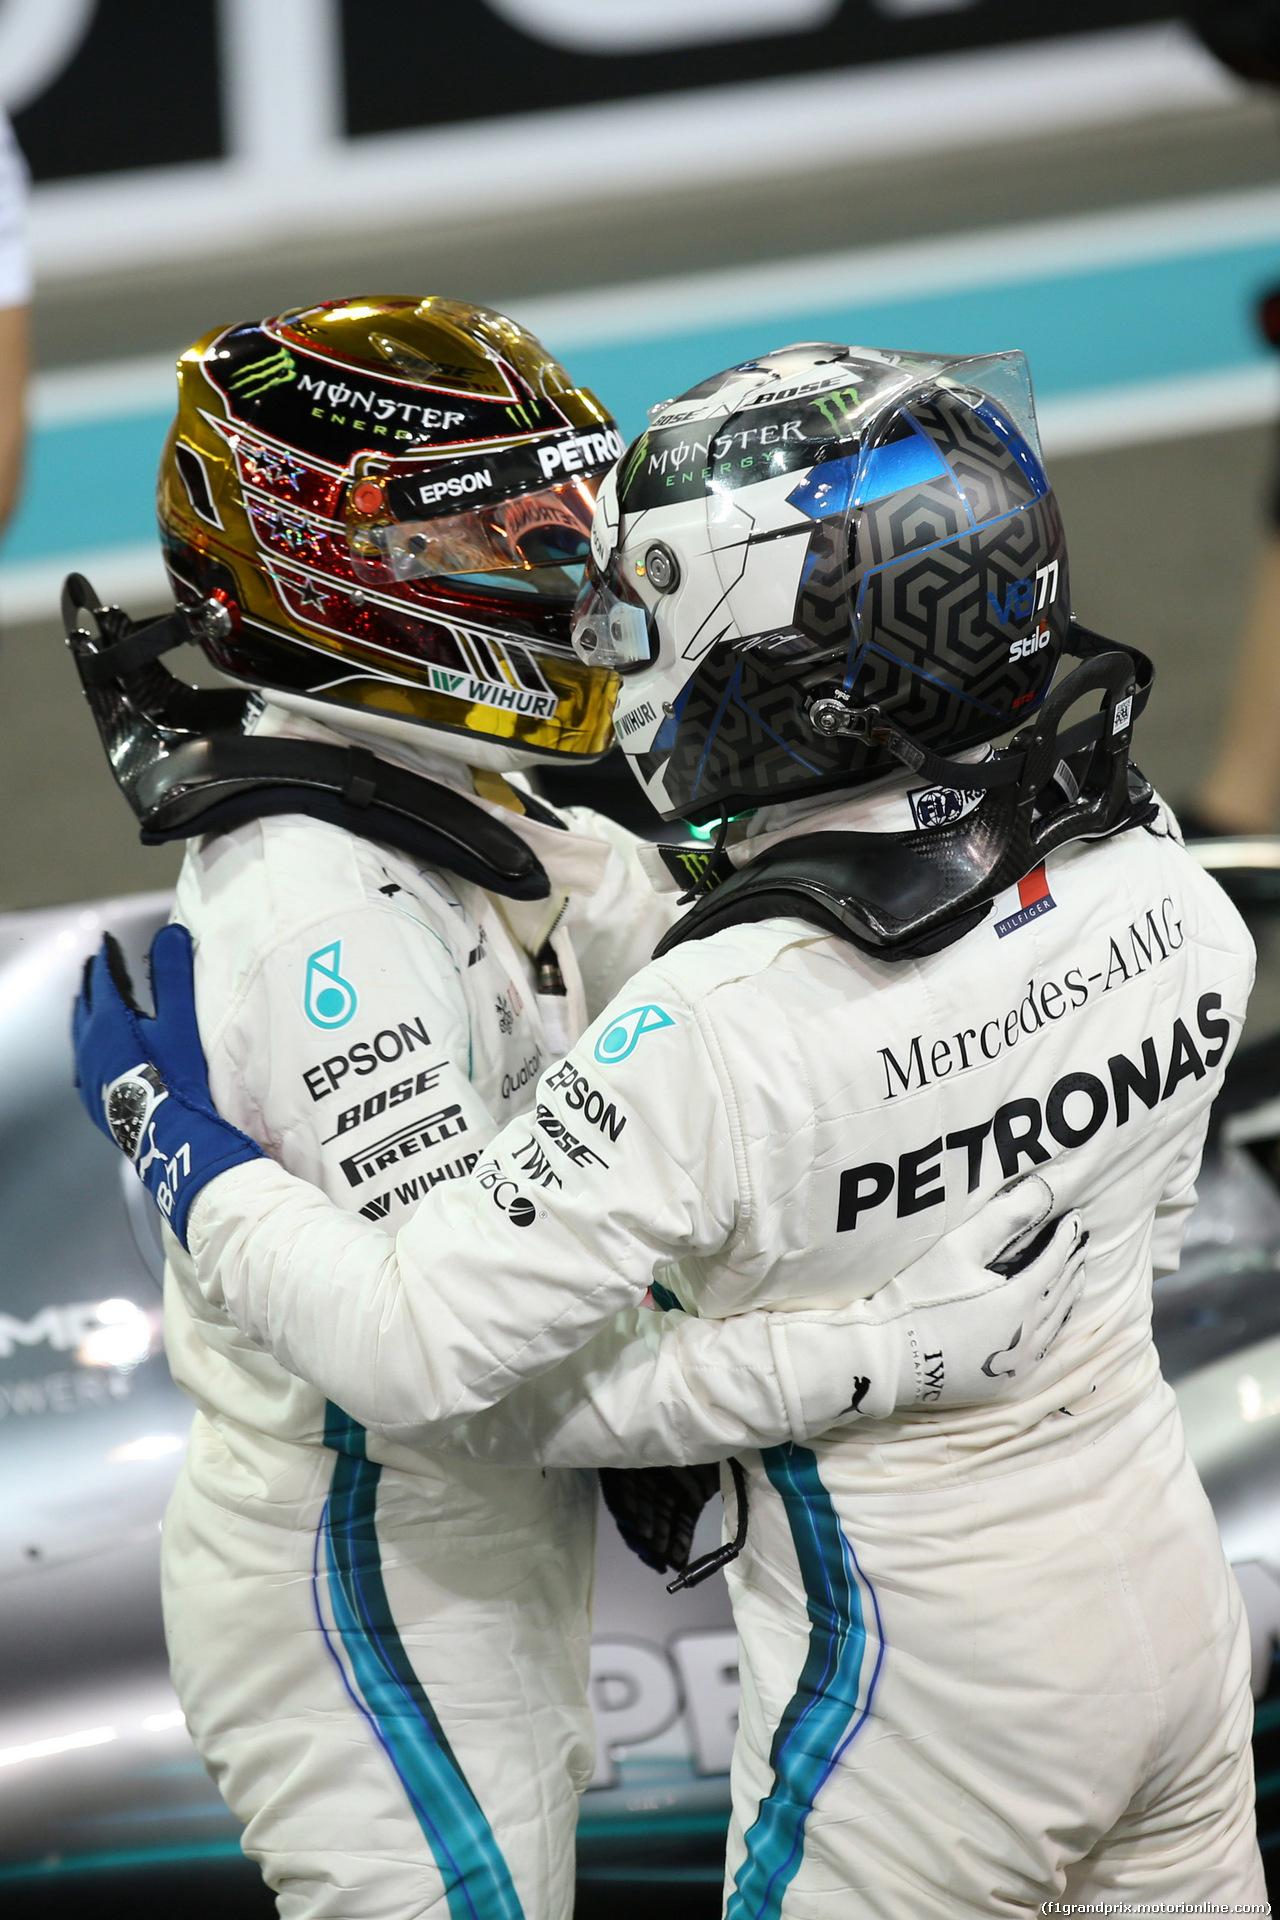 GP ABU DHABI, 24.11.2018 - Qualifiche, Lewis Hamilton (GBR) Mercedes AMG F1 W09 pole position e 2nd place Valtteri Bottas (FIN) Mercedes AMG F1 W09